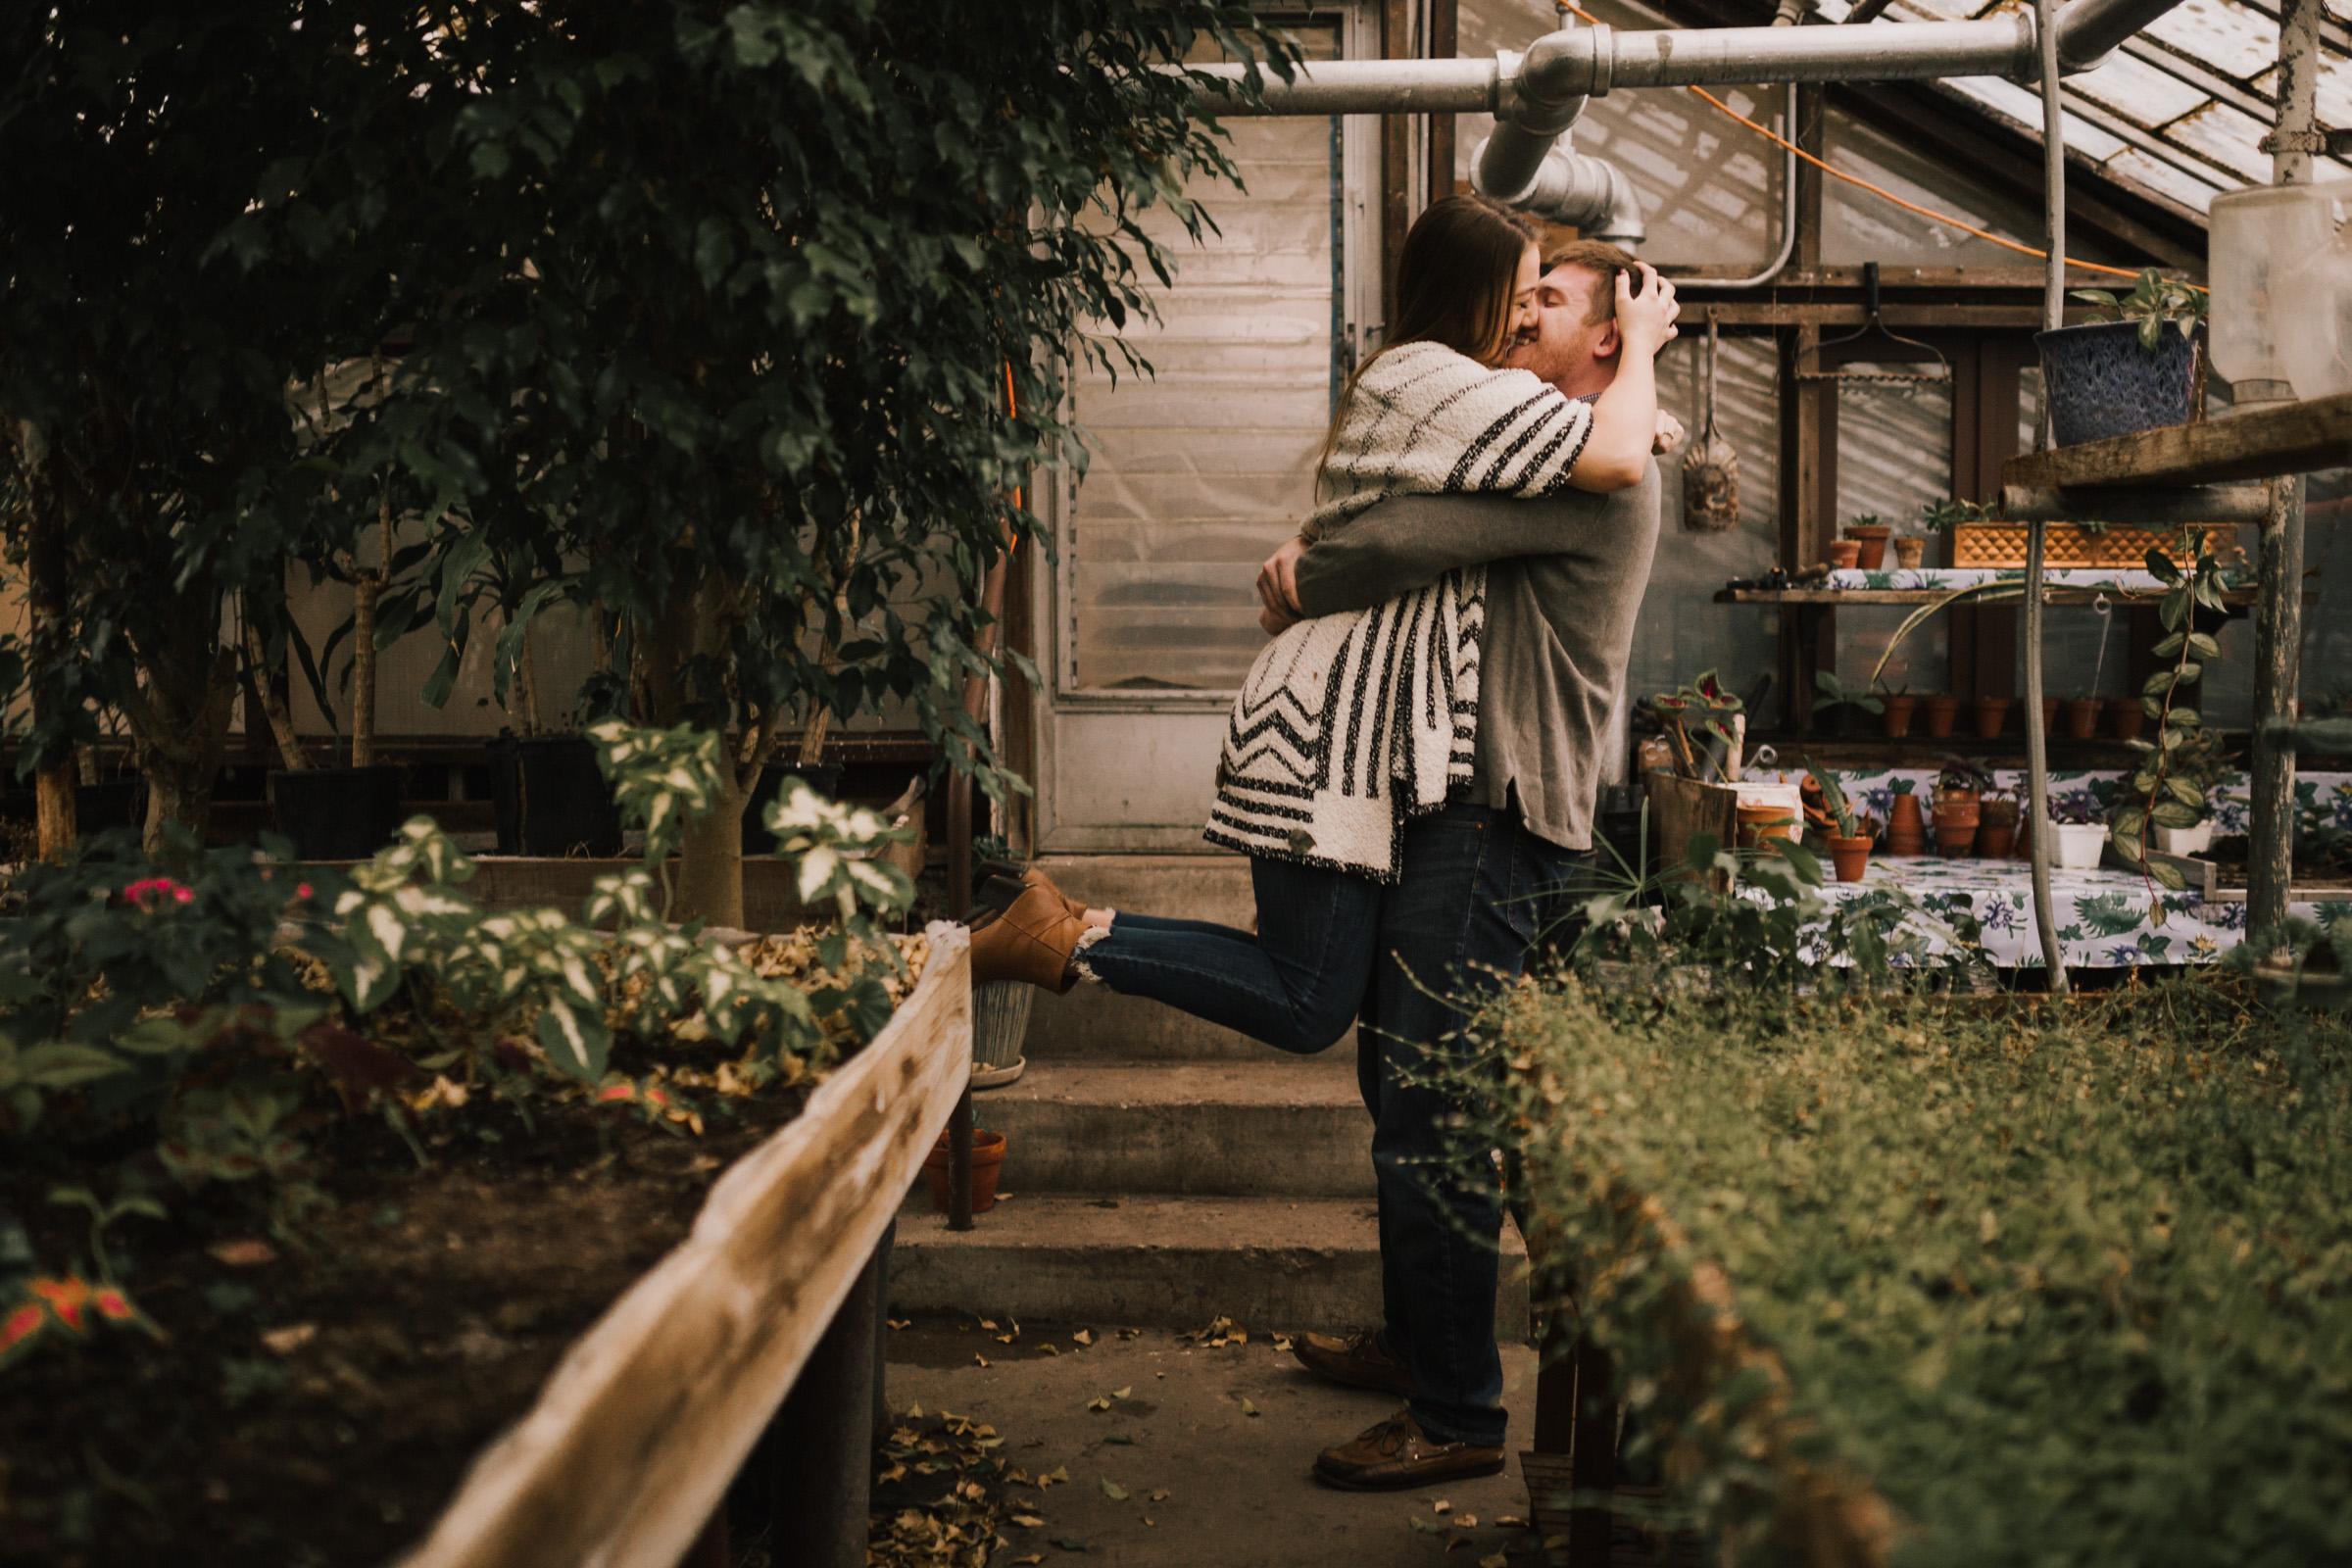 alyssa barletter photography johns greenhouse kansas city missouri brookside waldo engagement session winter-20.jpg